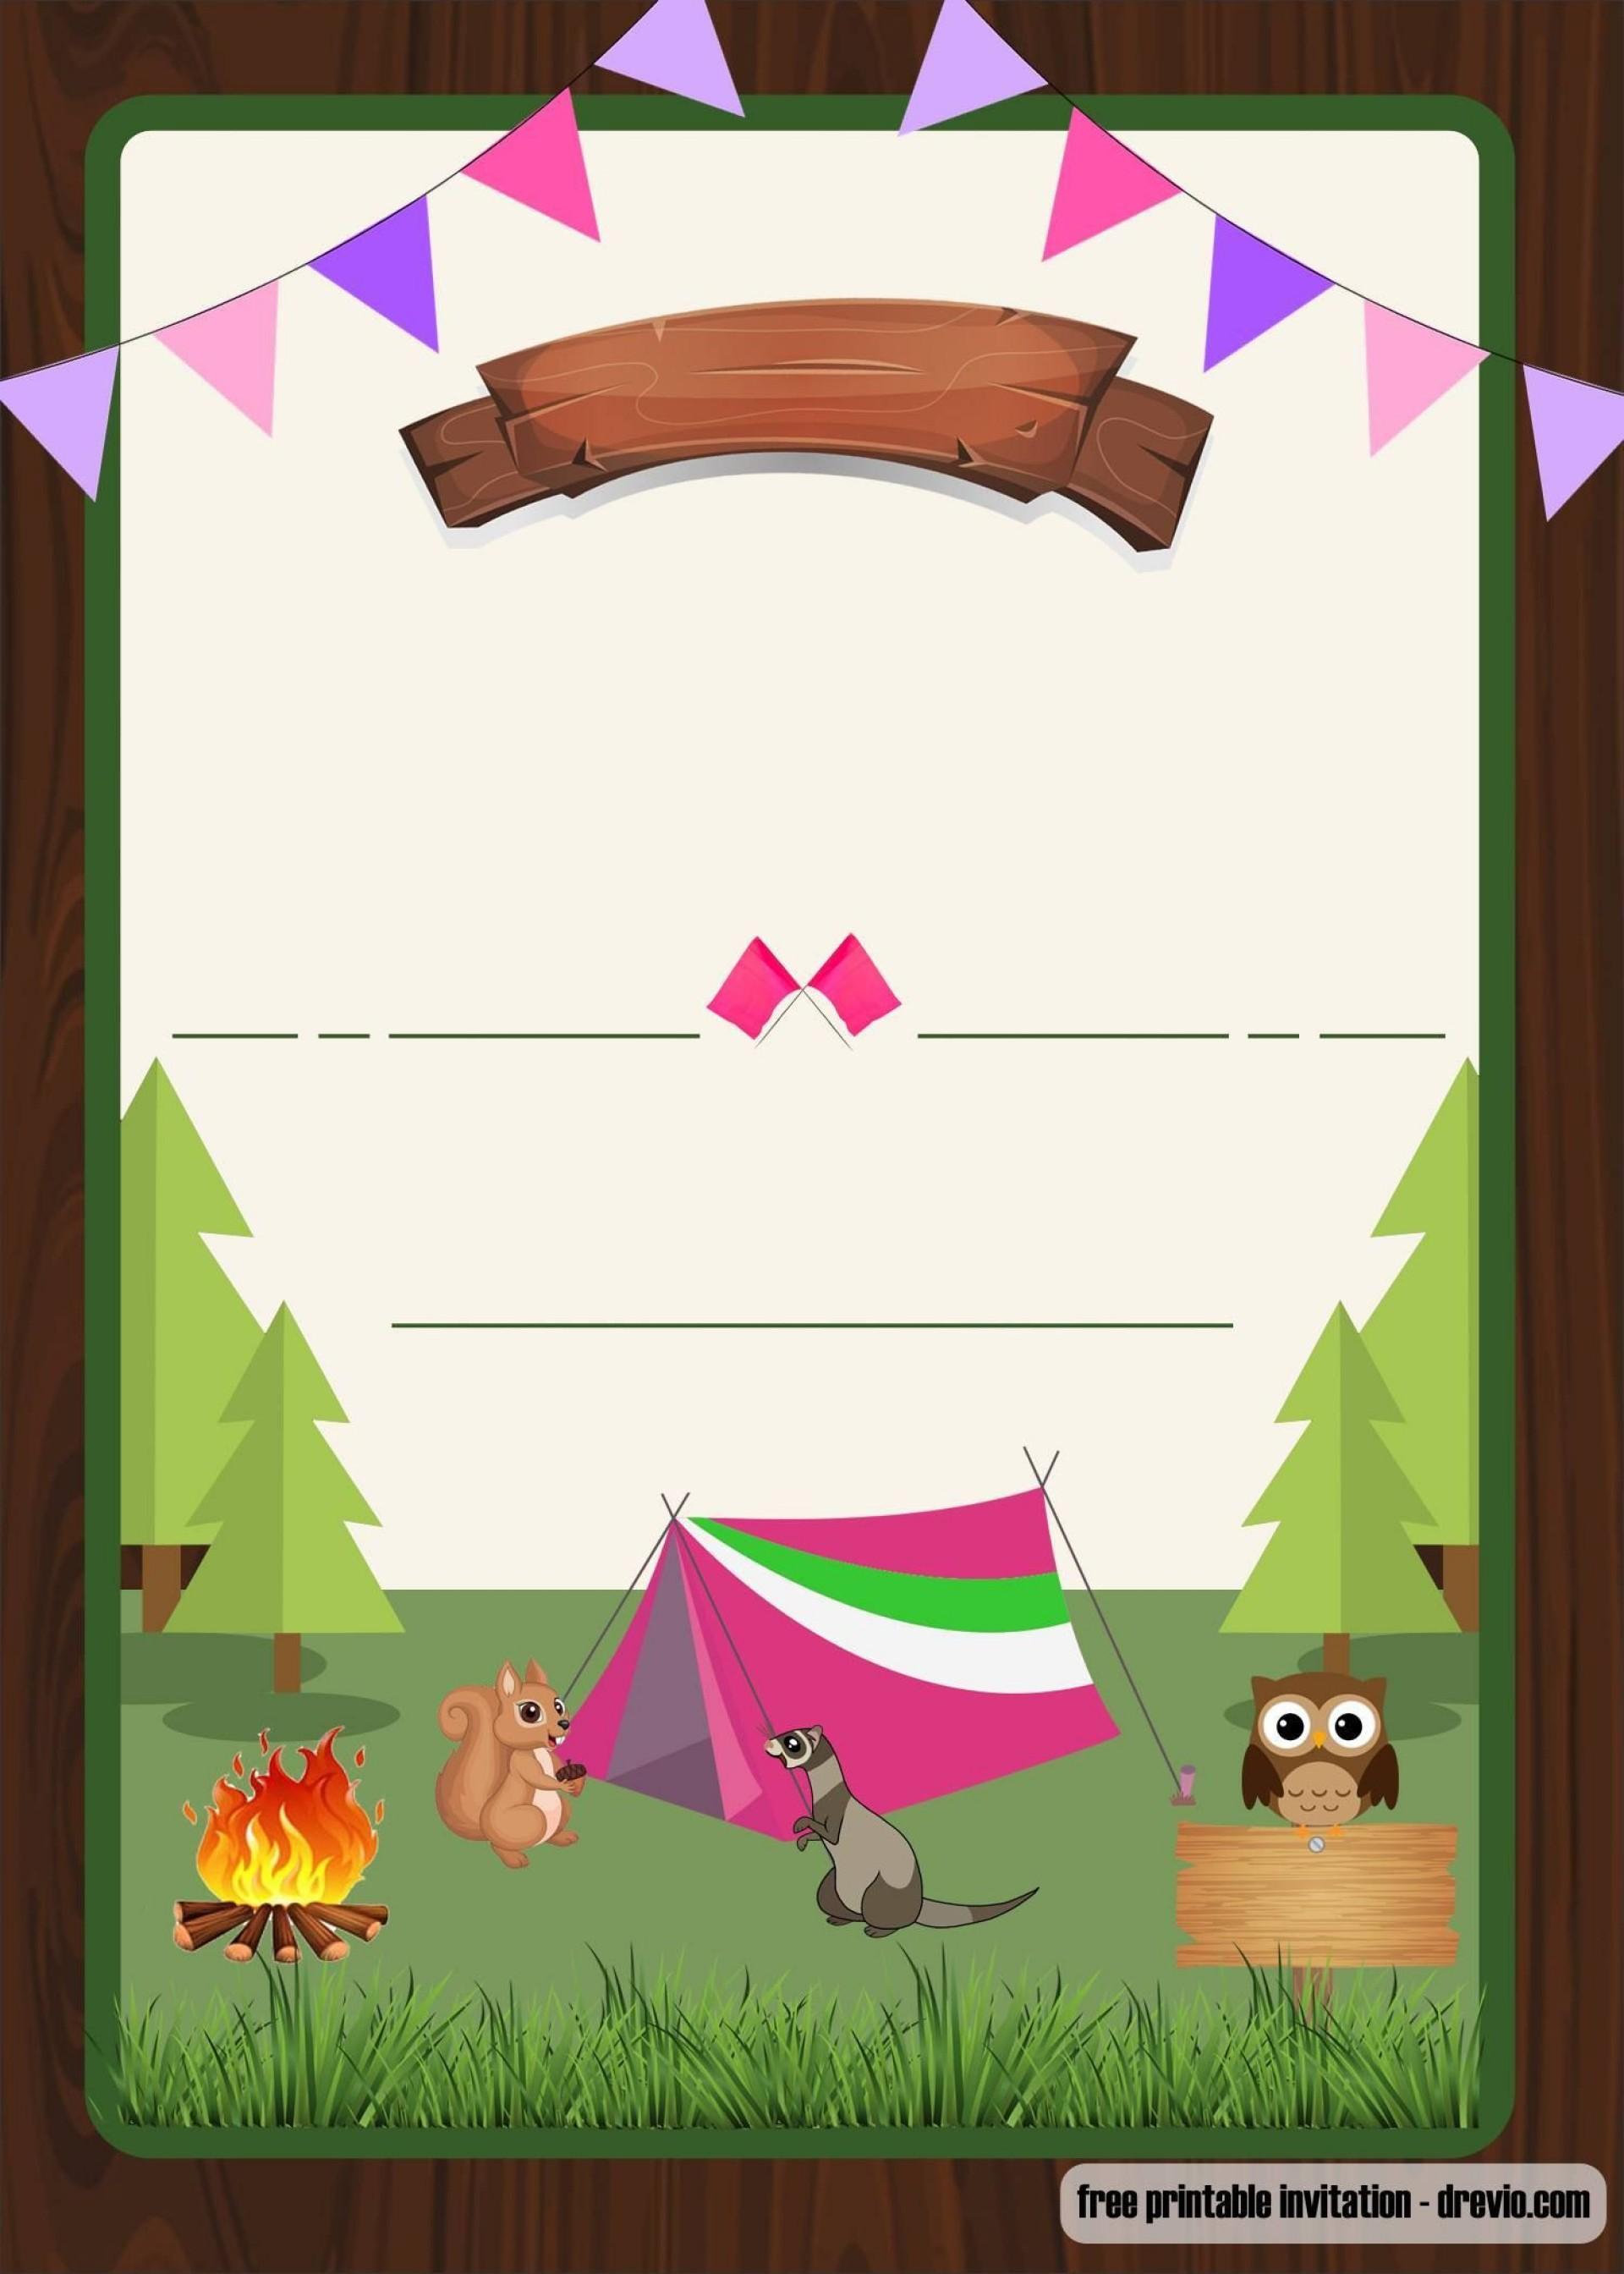 004 Wondrou Camping Invitation Template Free Example  Party Birthday1920